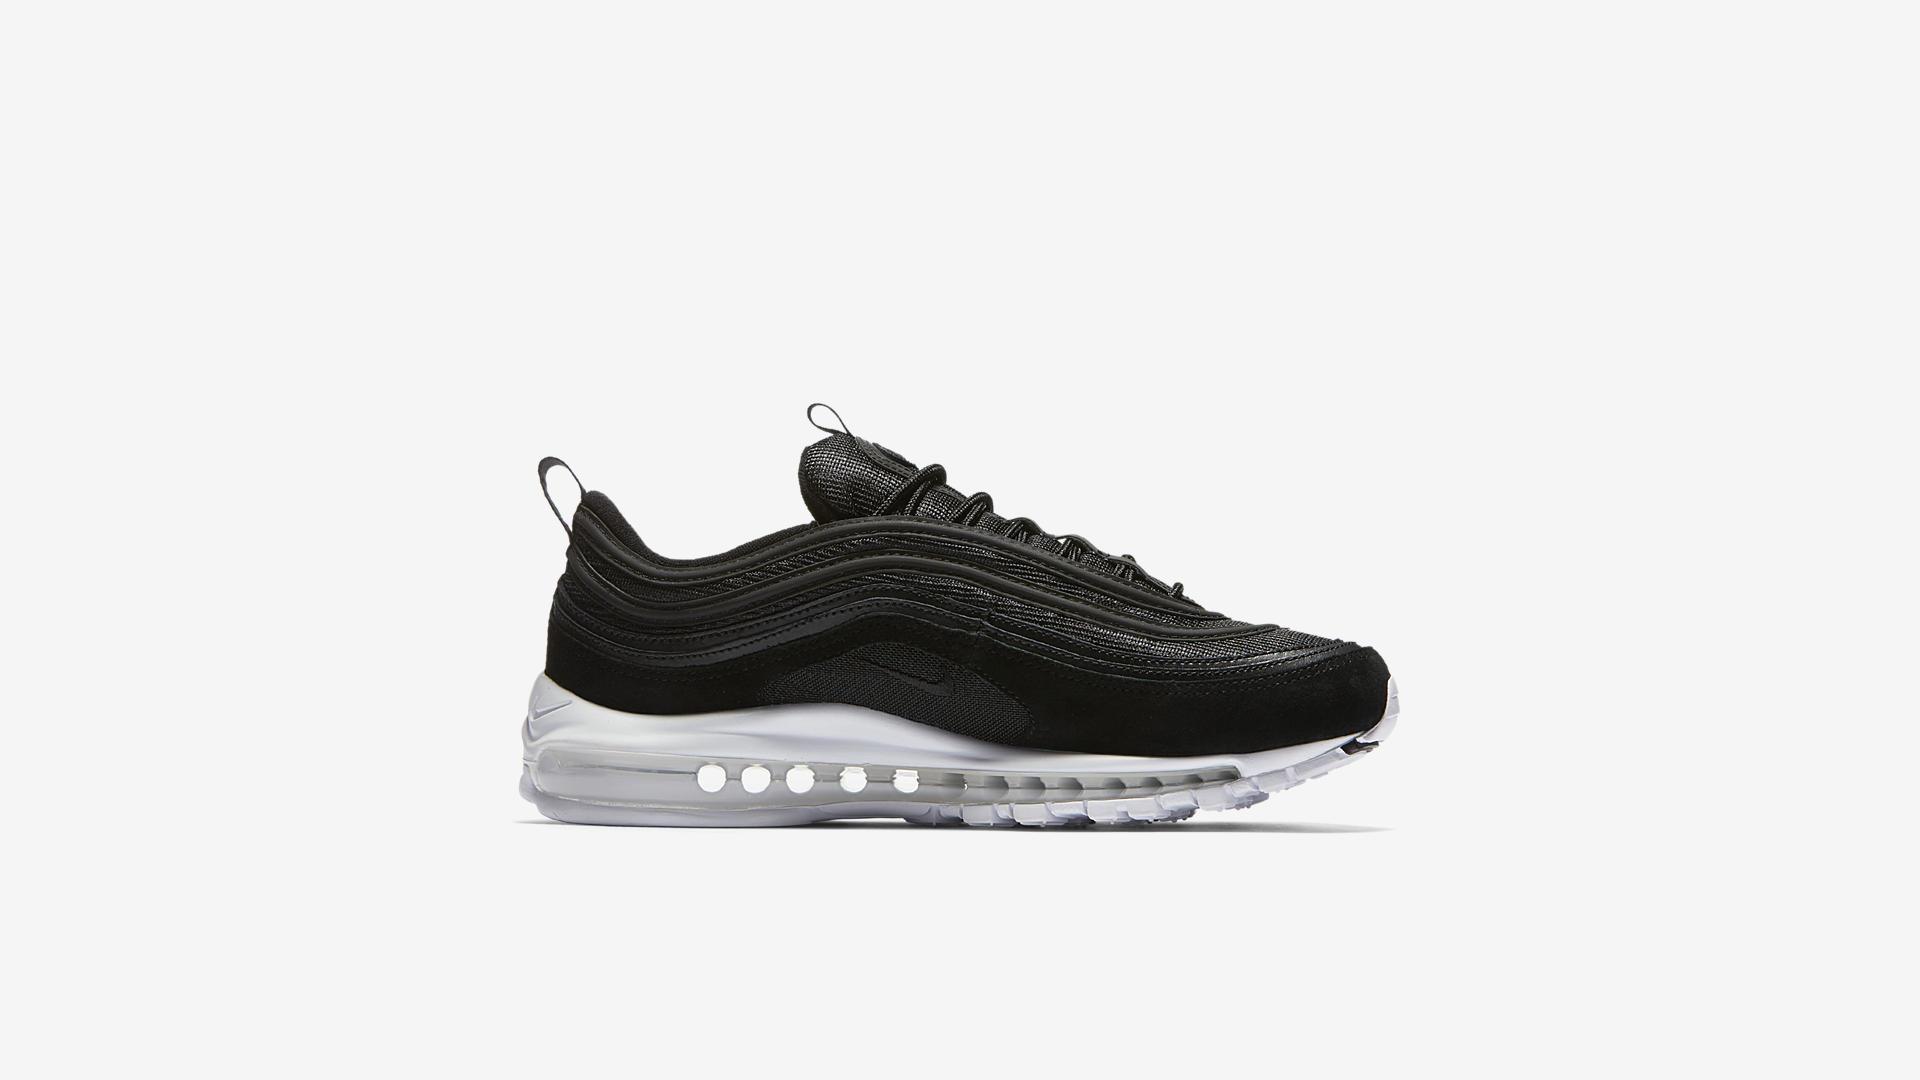 921826 003 Nike Air Max 97 Black 4